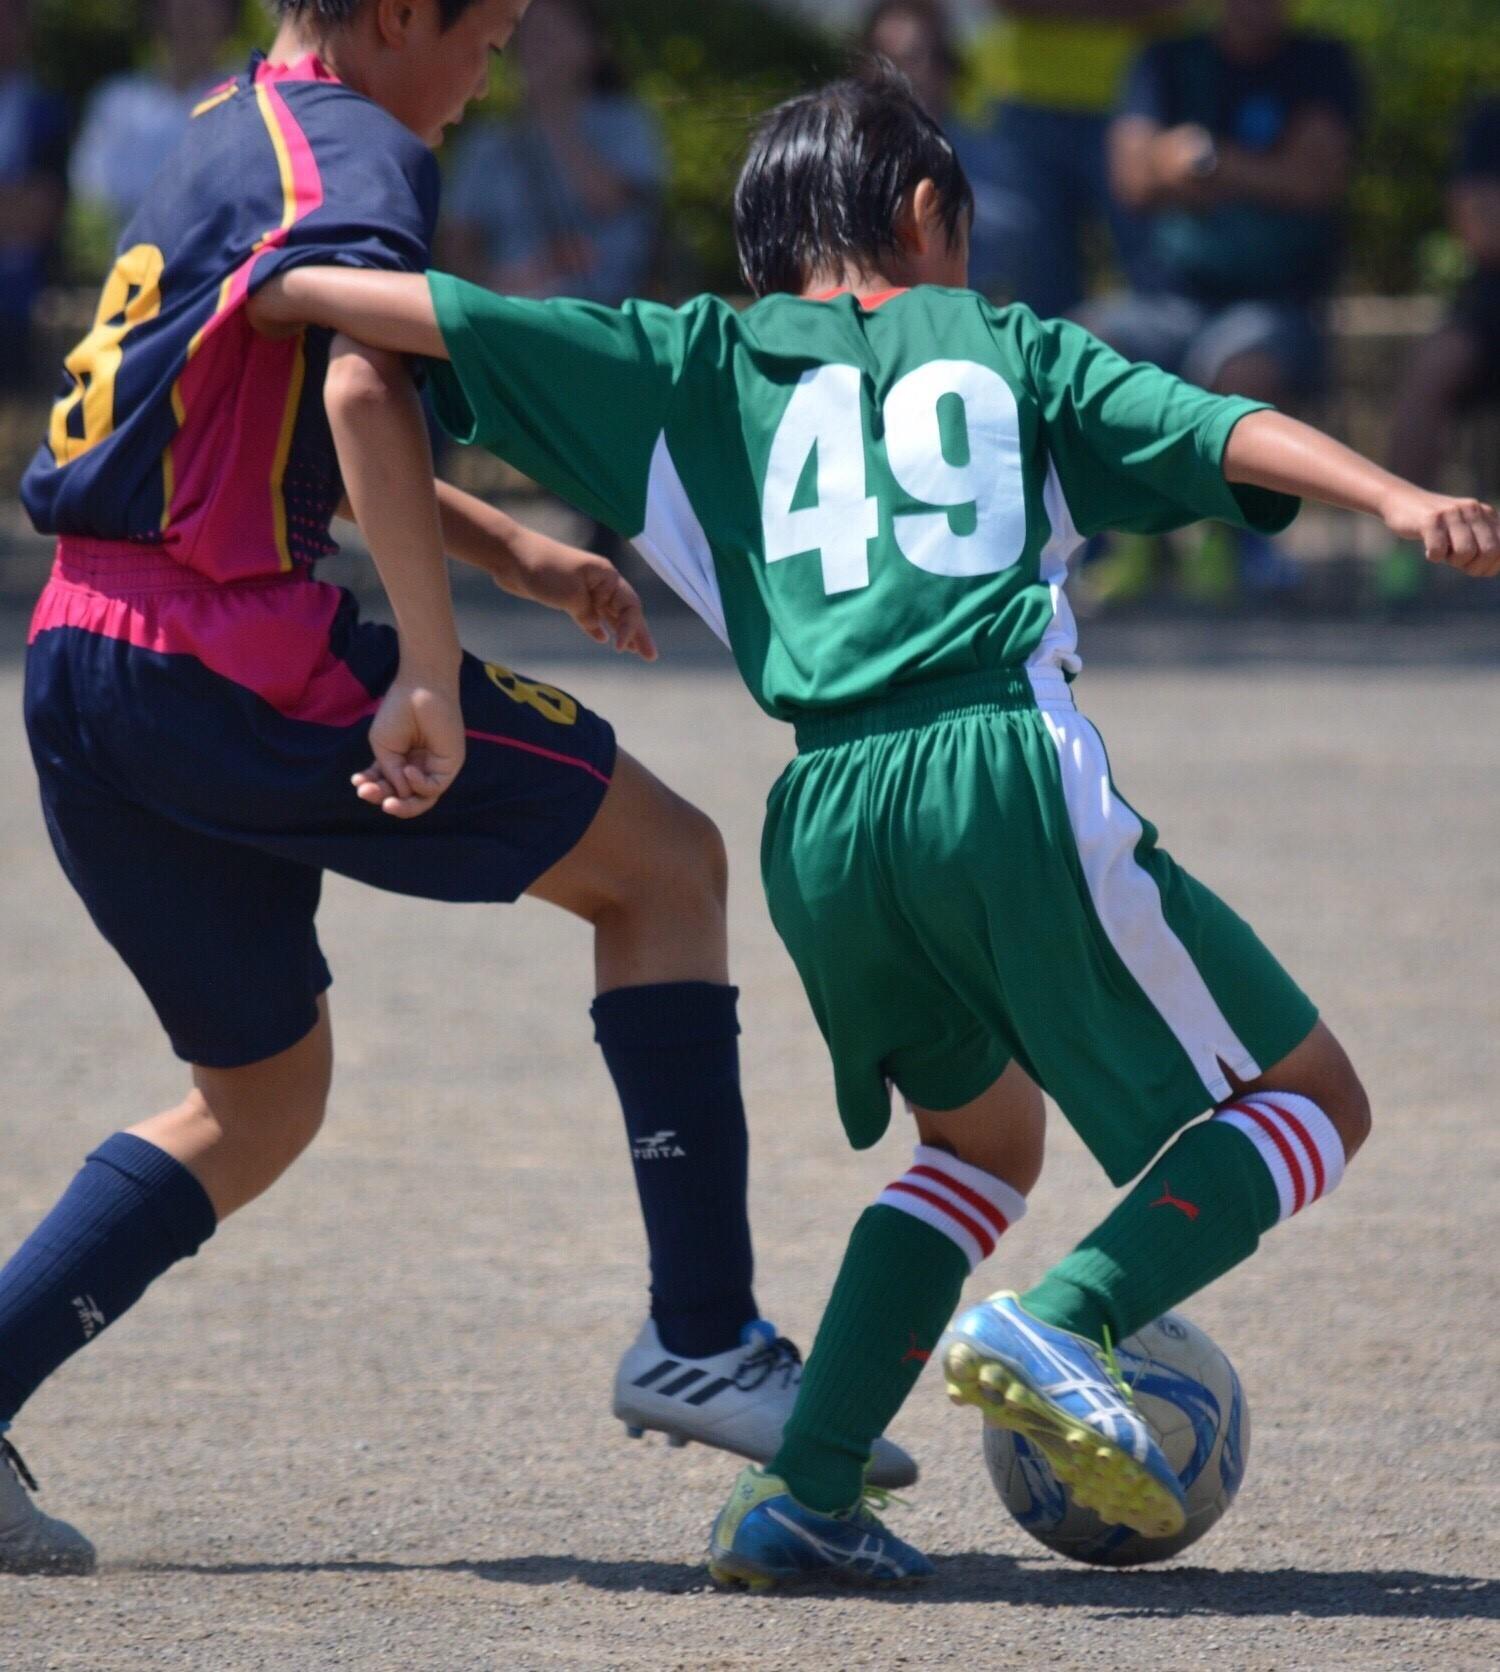 6/26 Uー11 KTSリーグ